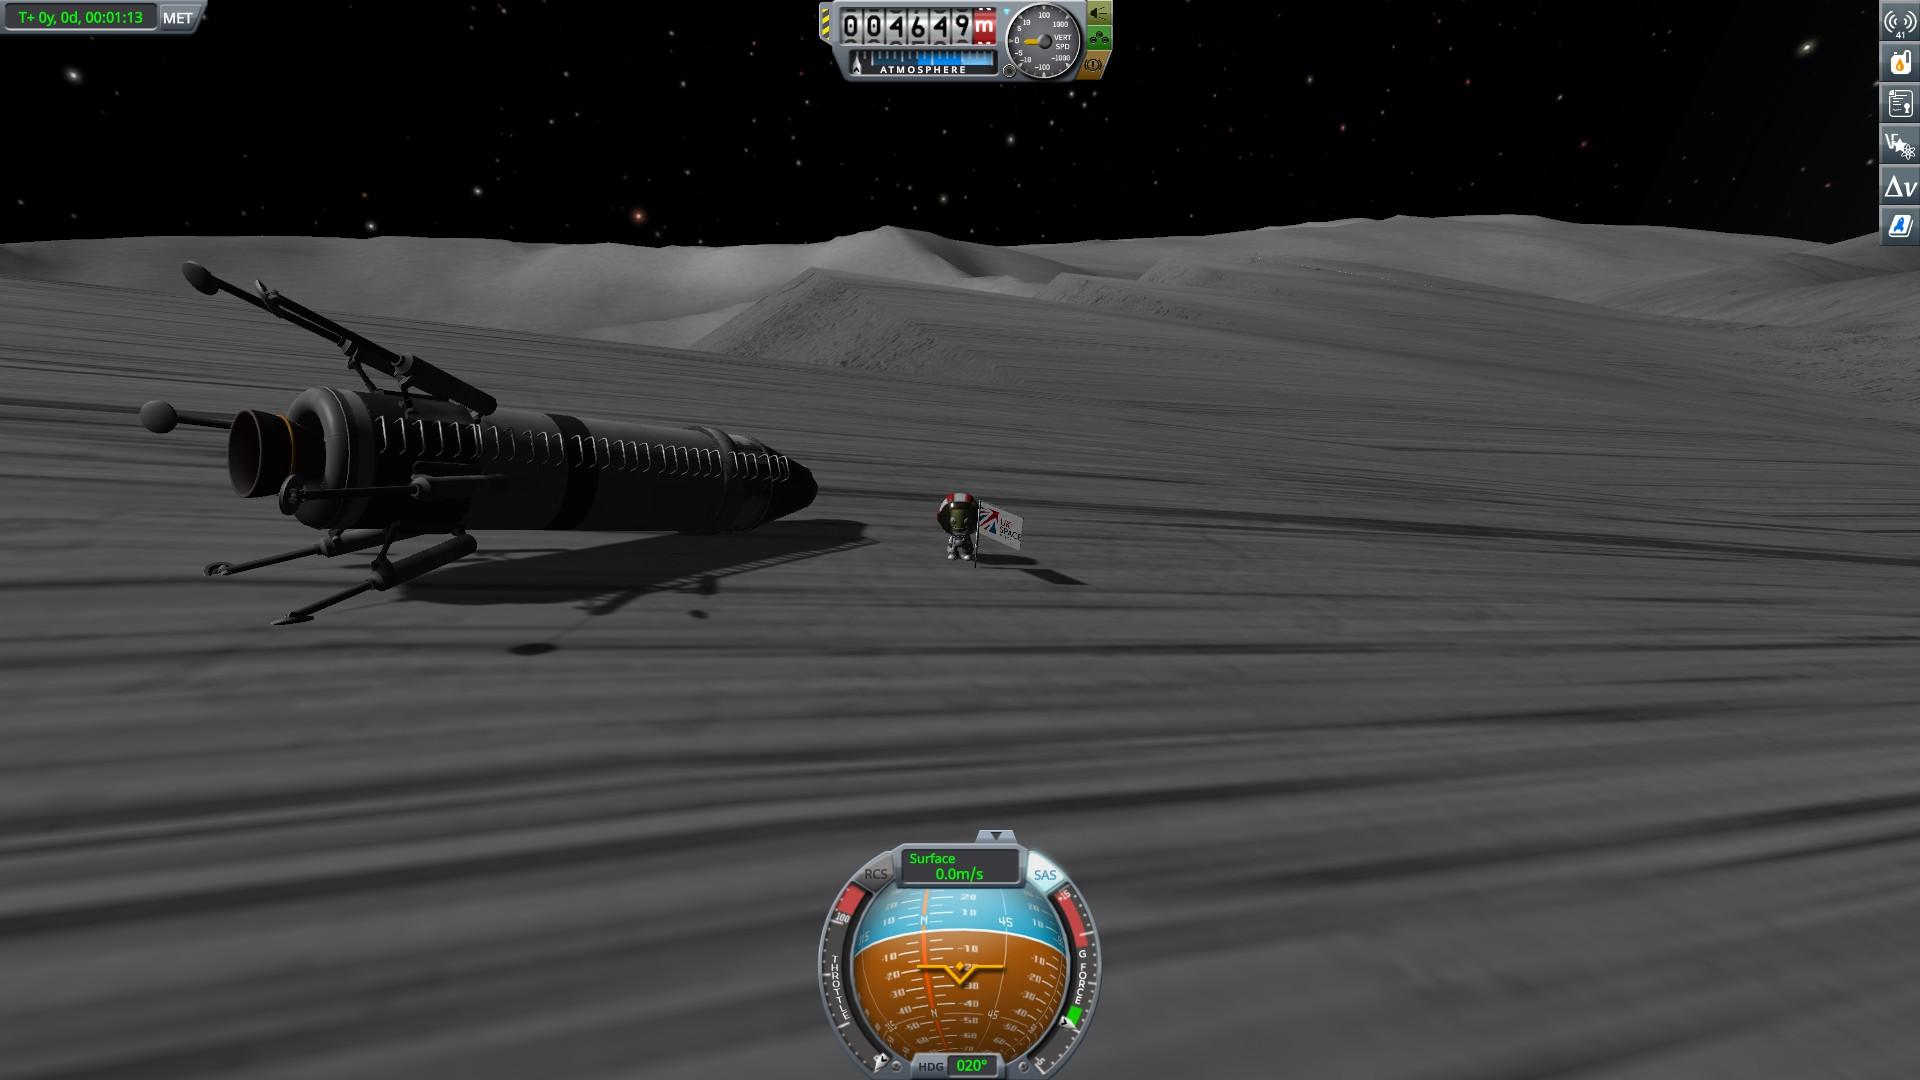 Copper Ice | KSP: Mun Landing! Sorta…